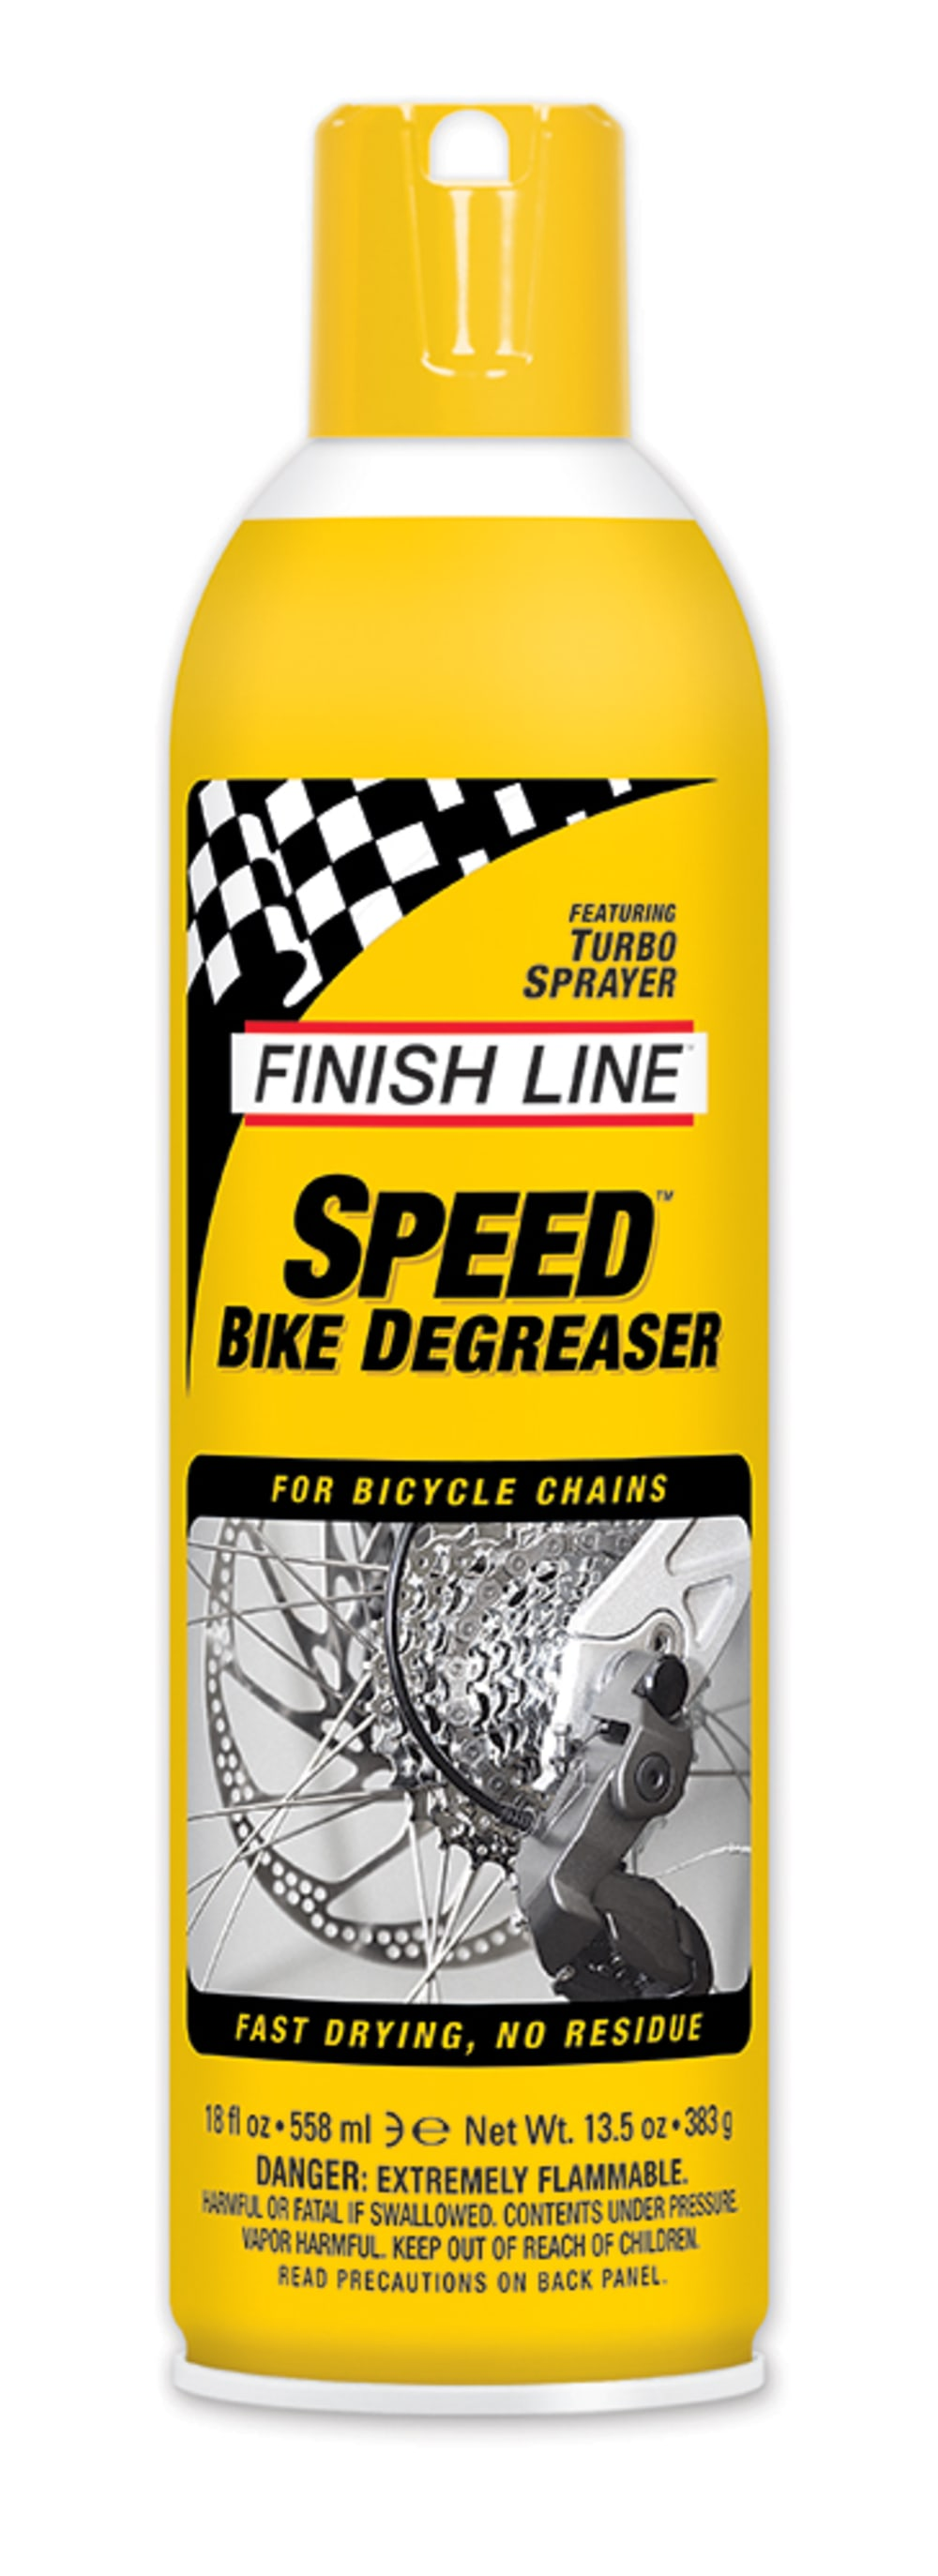 FINISH LINE Speed Bike Degreaser - NONE